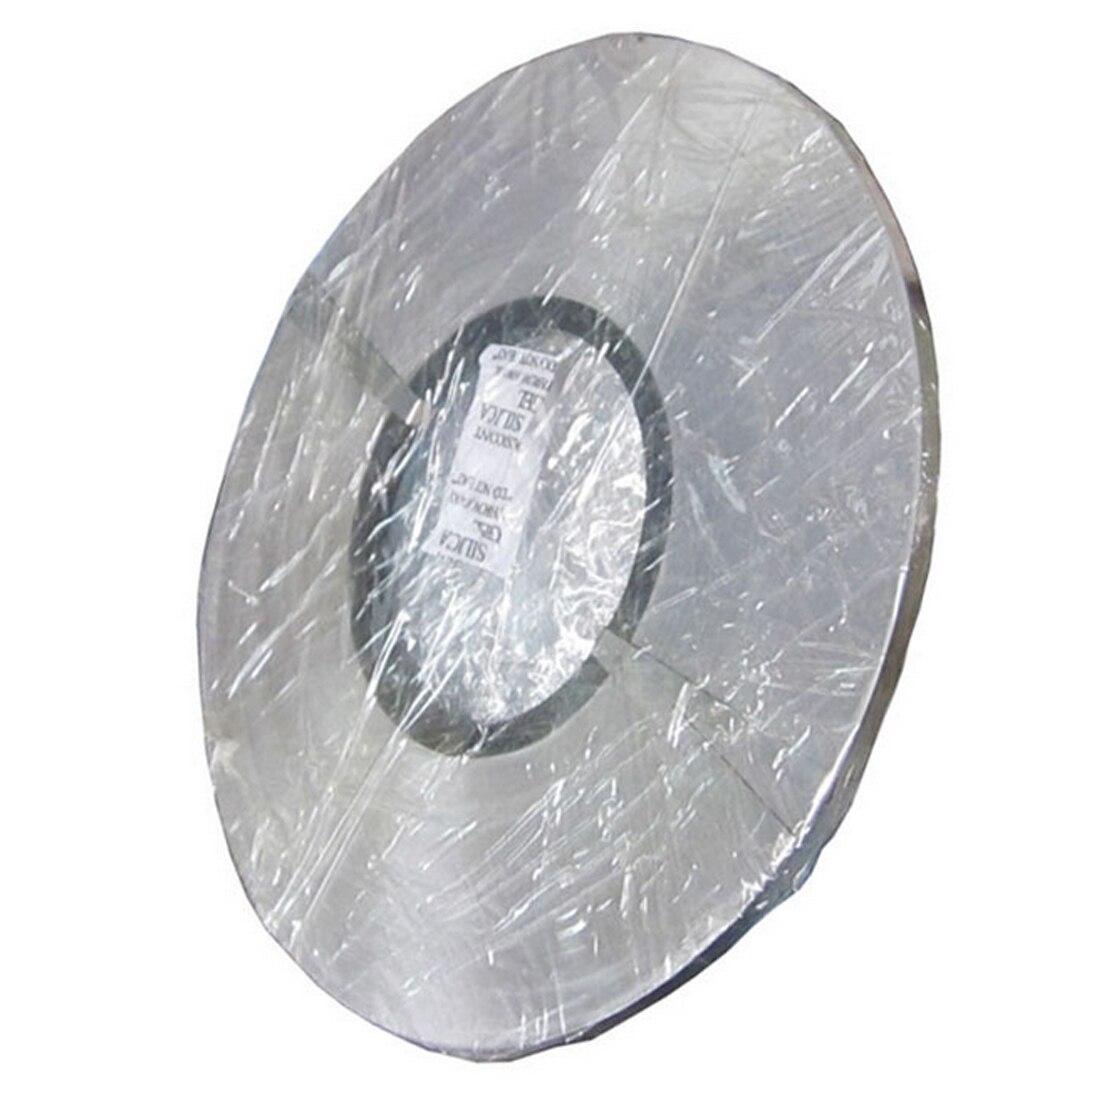 New 0.1 X 5mm 2M Pure Nickel Strip Tape For Li 18650 Battery Spot Welding Compatible For Spot Welder Machine